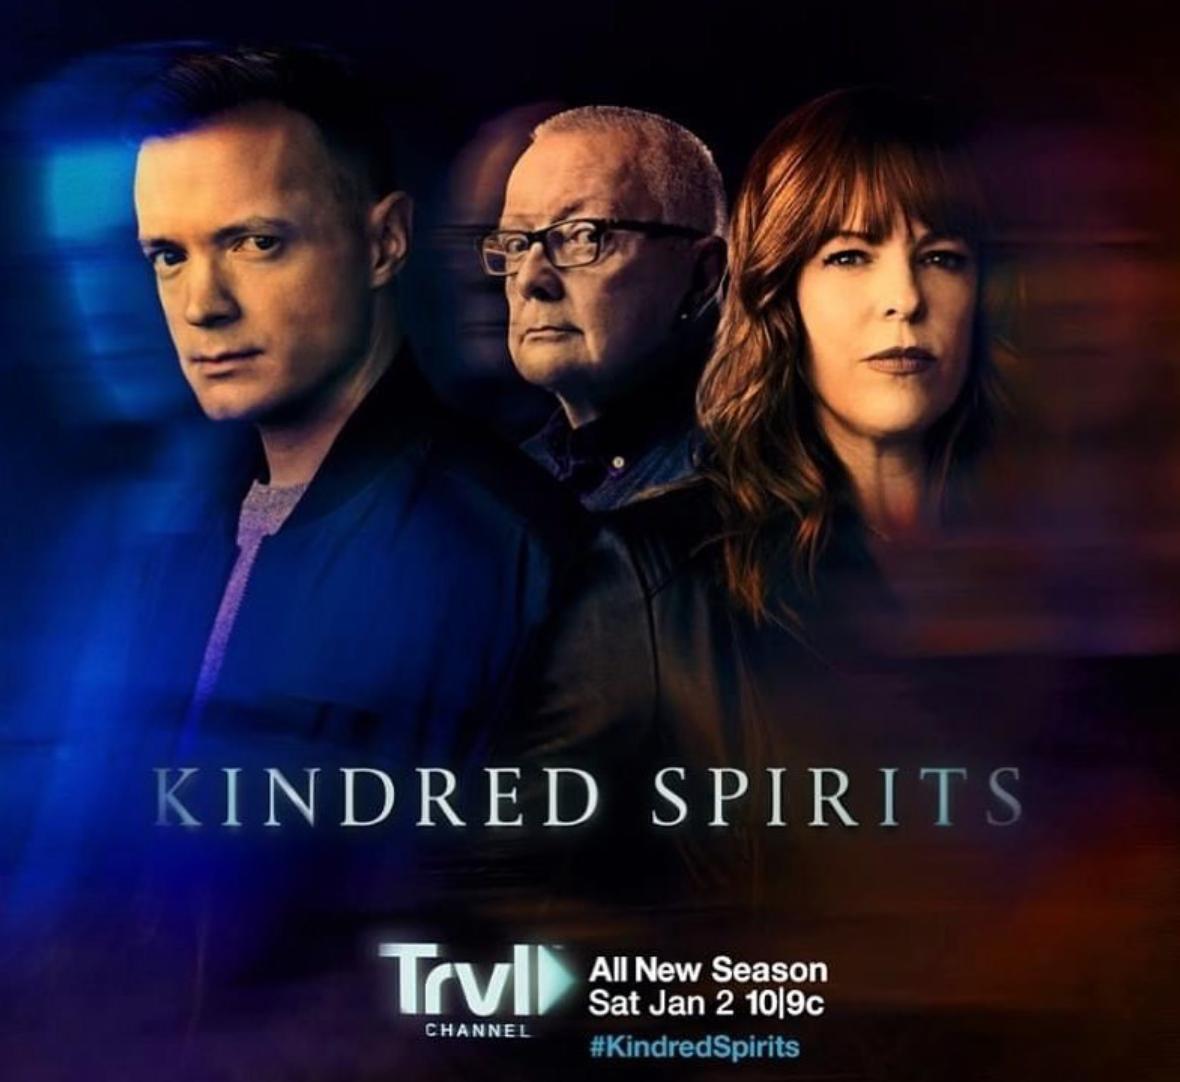 chip-kindred-spirits-1610219583234.png